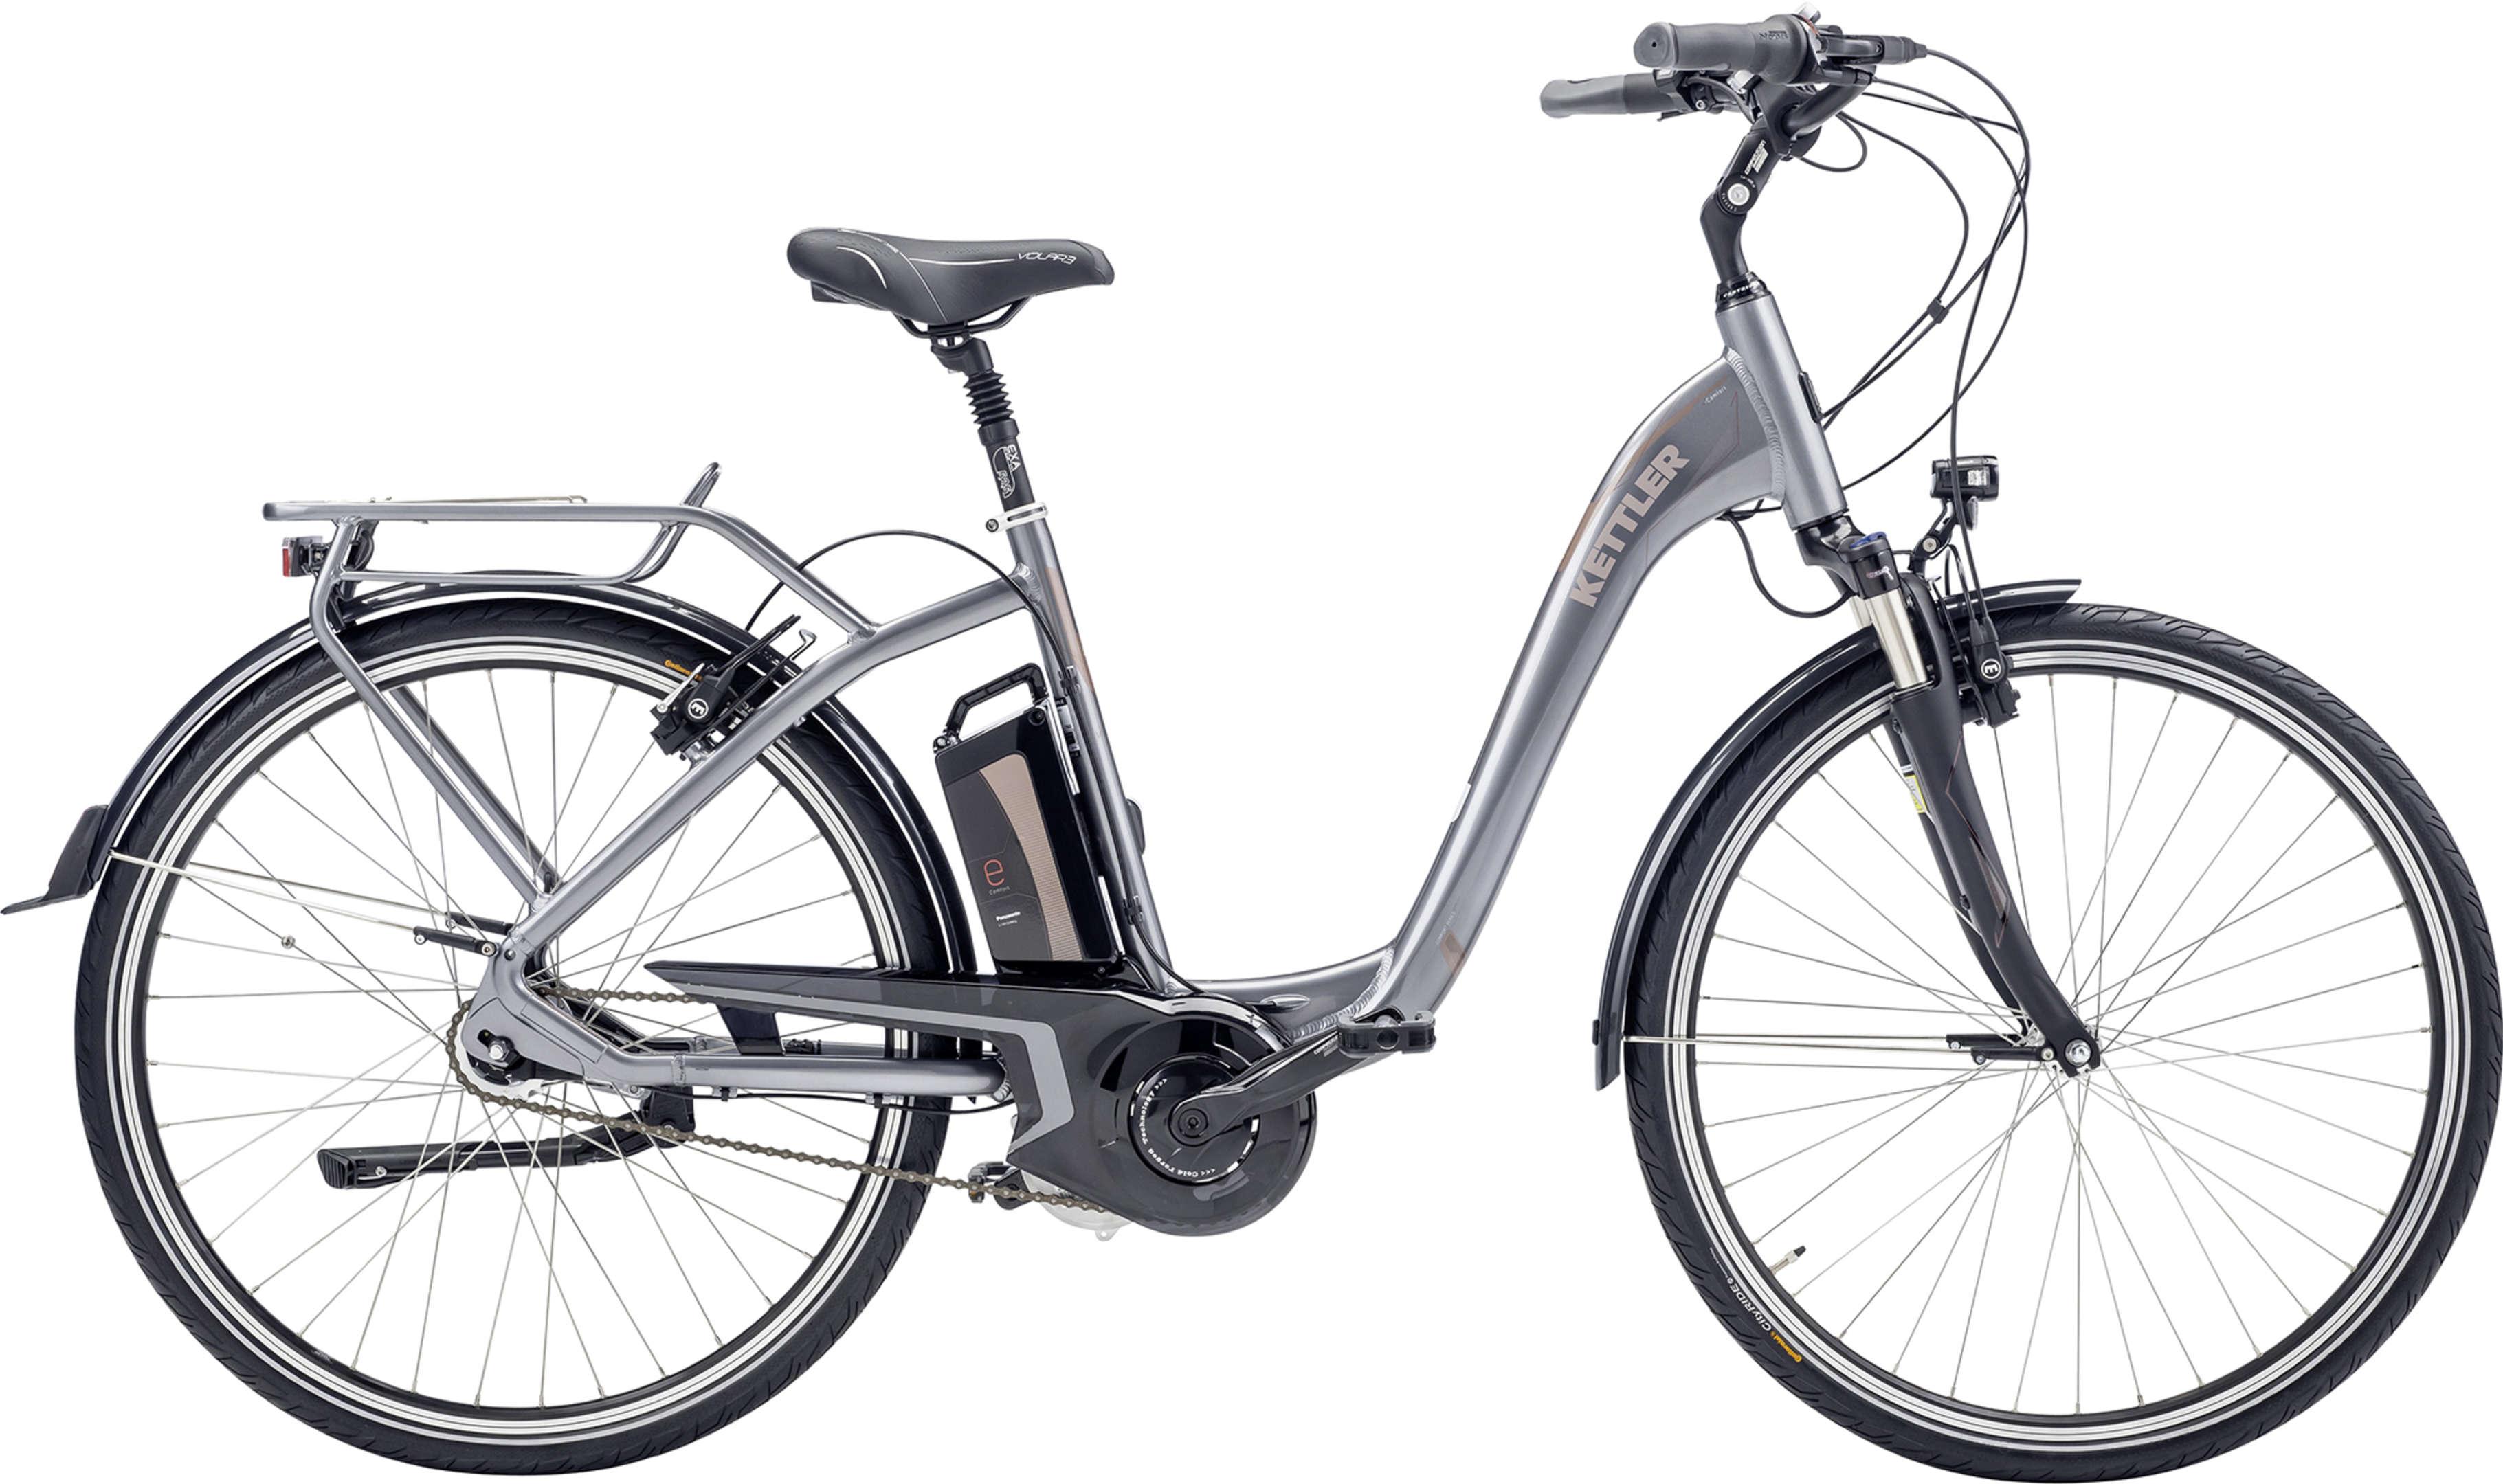 94a4d7c78272ee Kettler Alu Rad E-Bike Twin RT - Eurorad BikeleasingEurorad Bikeleasing